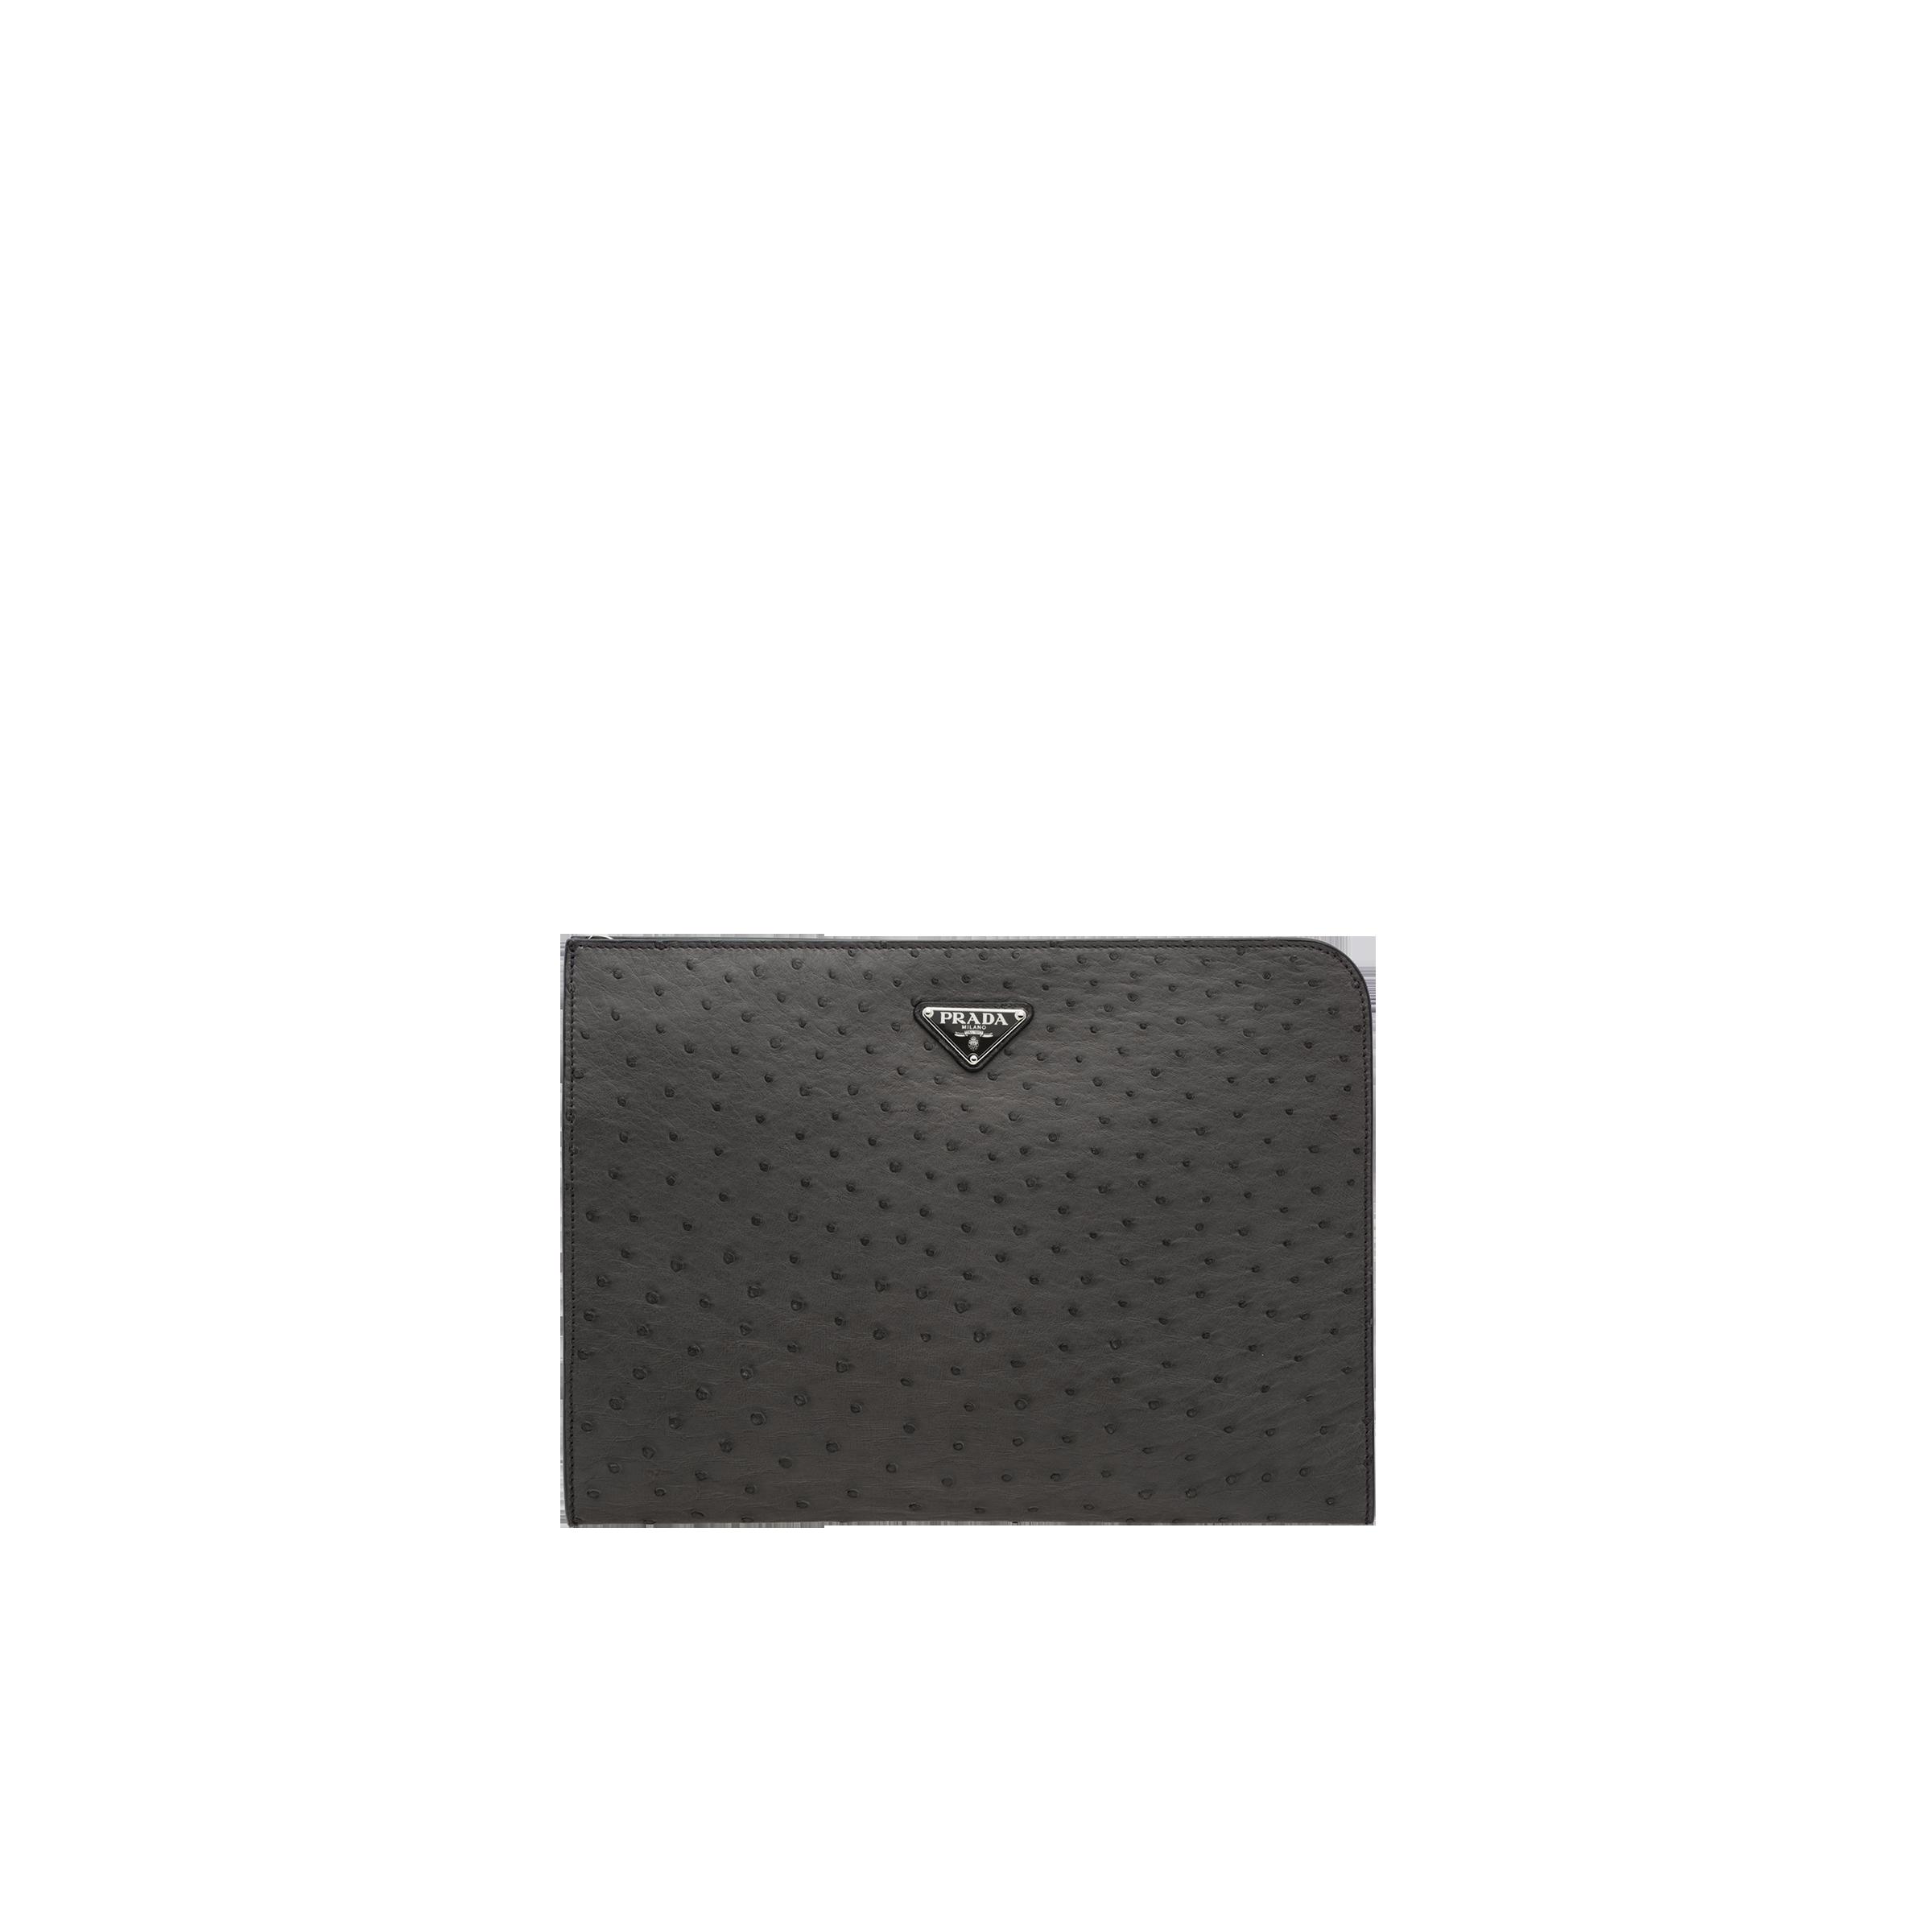 b52b5145e082 Ostrich leather document holder